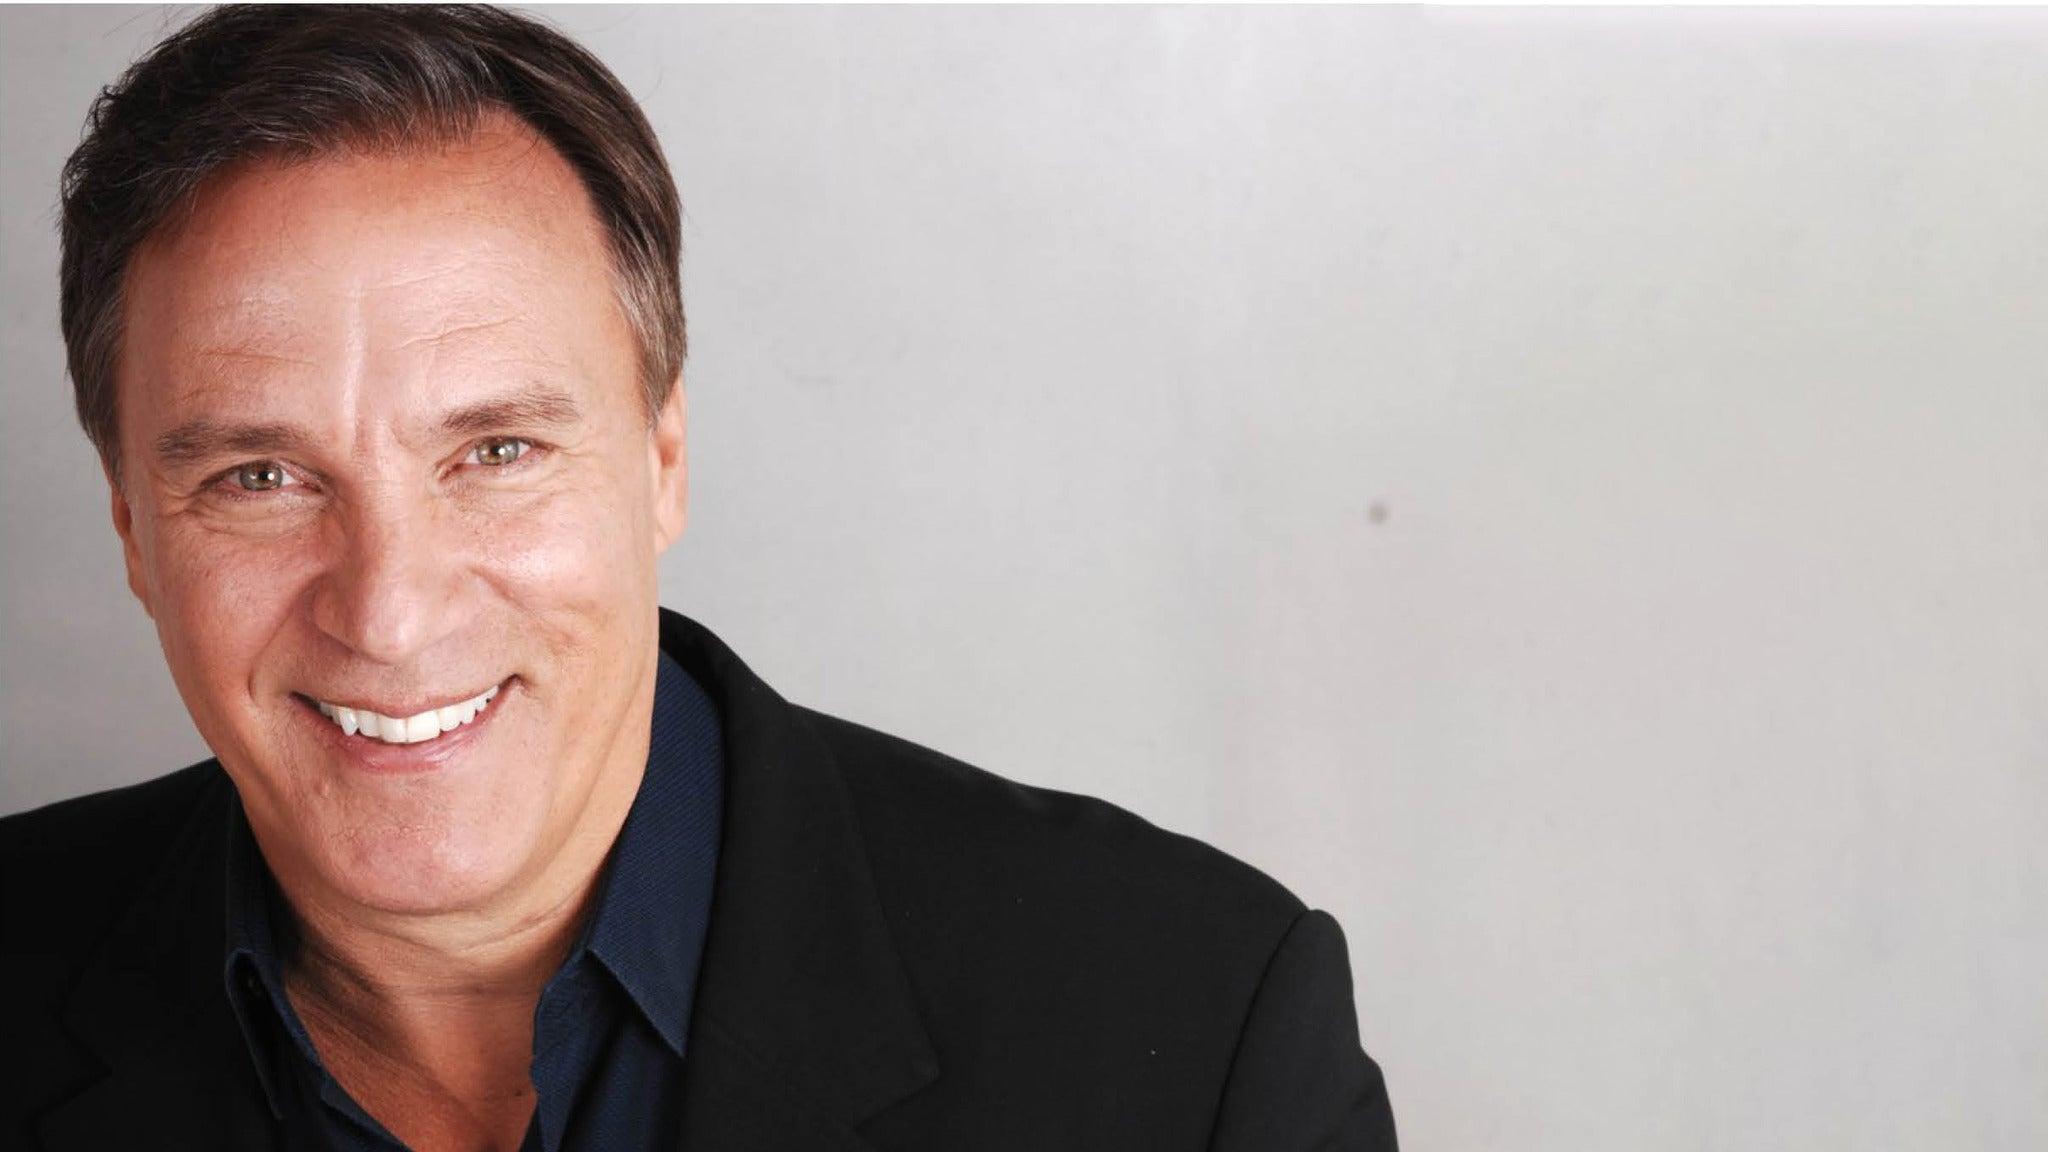 Craig Shoemaker at Irvine Improv